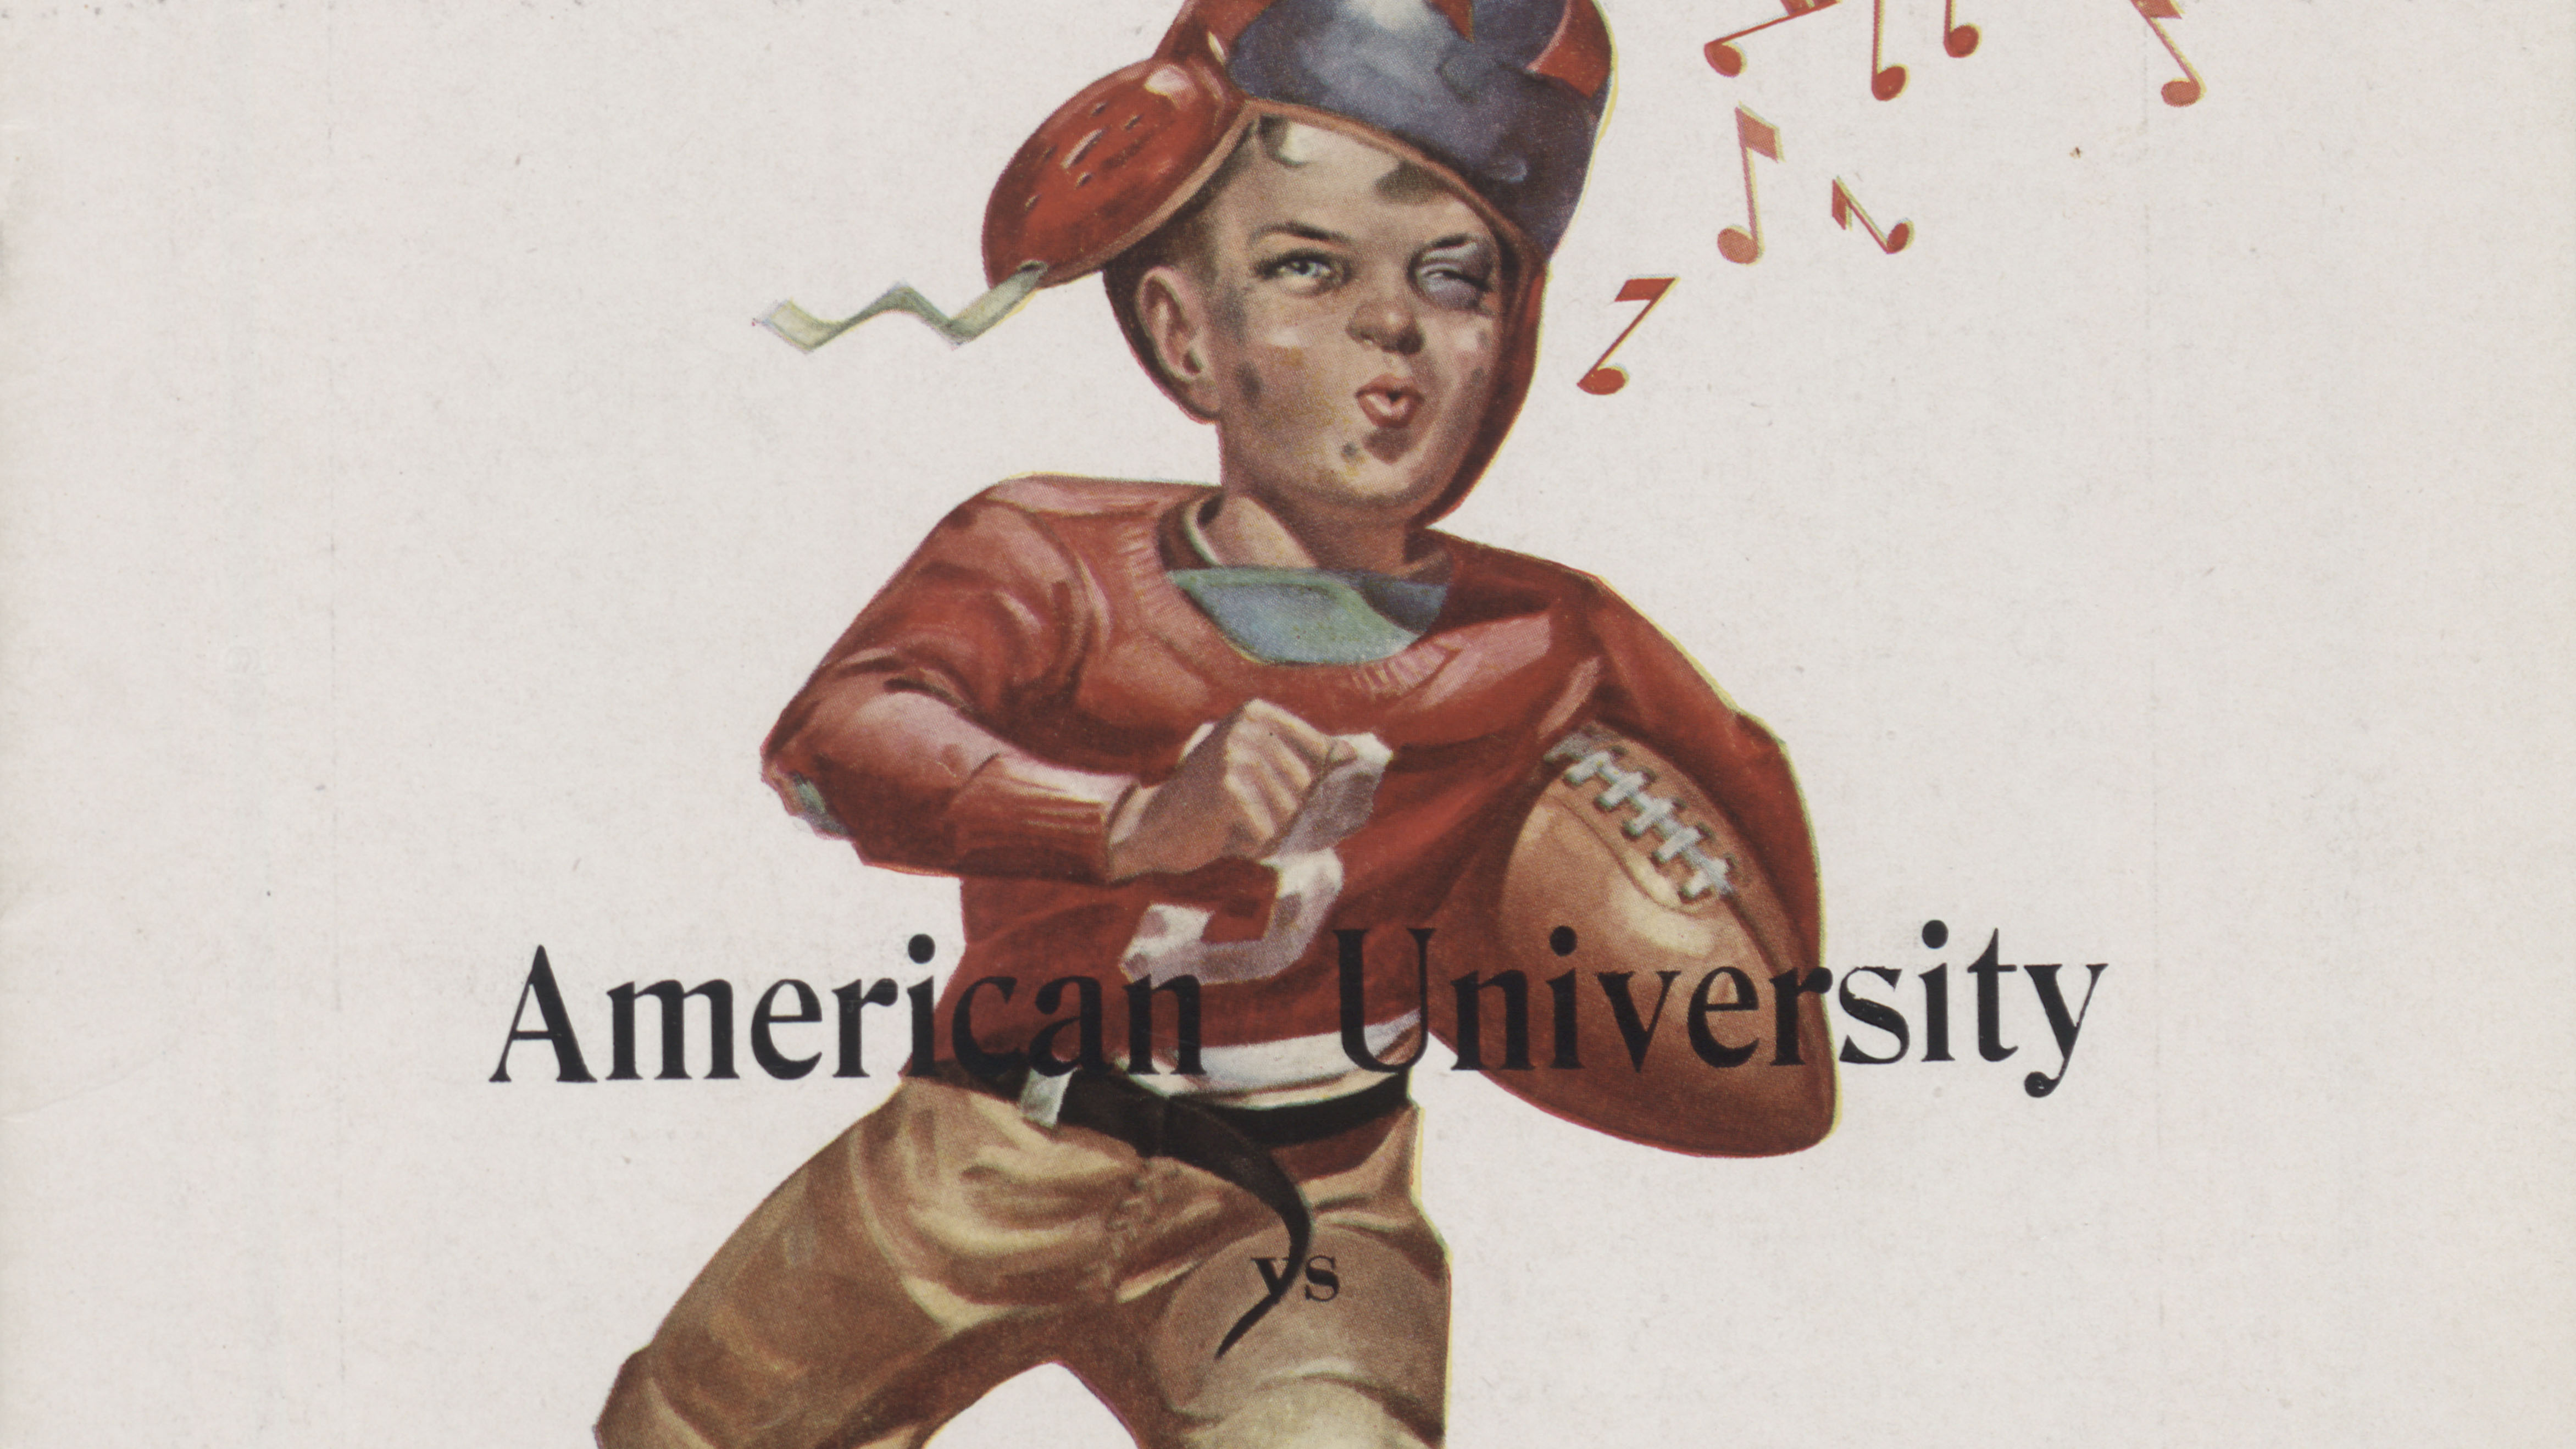 American University Football  Programs